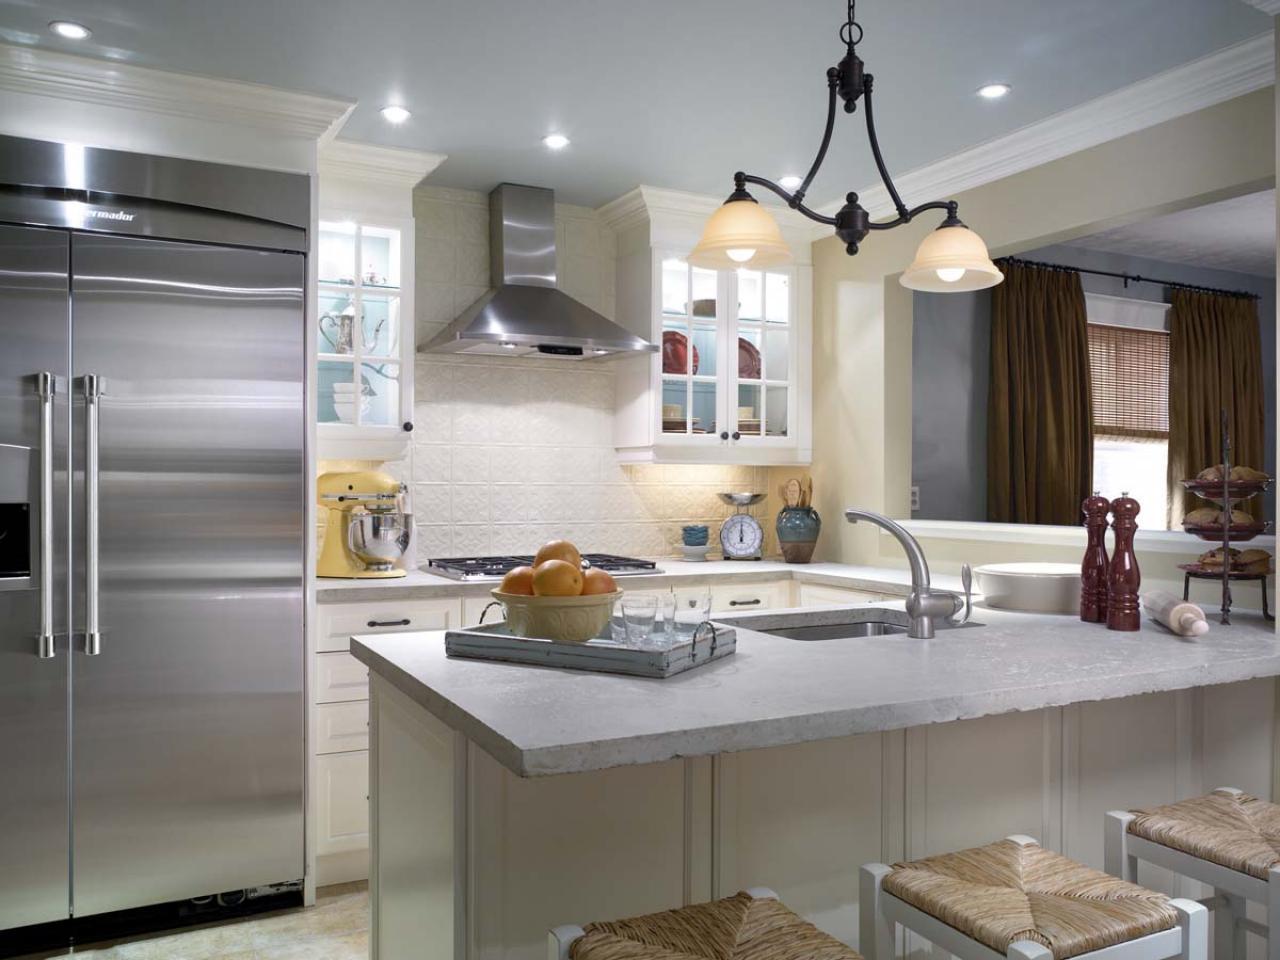 candice olson kitchen design pictures photo - 5